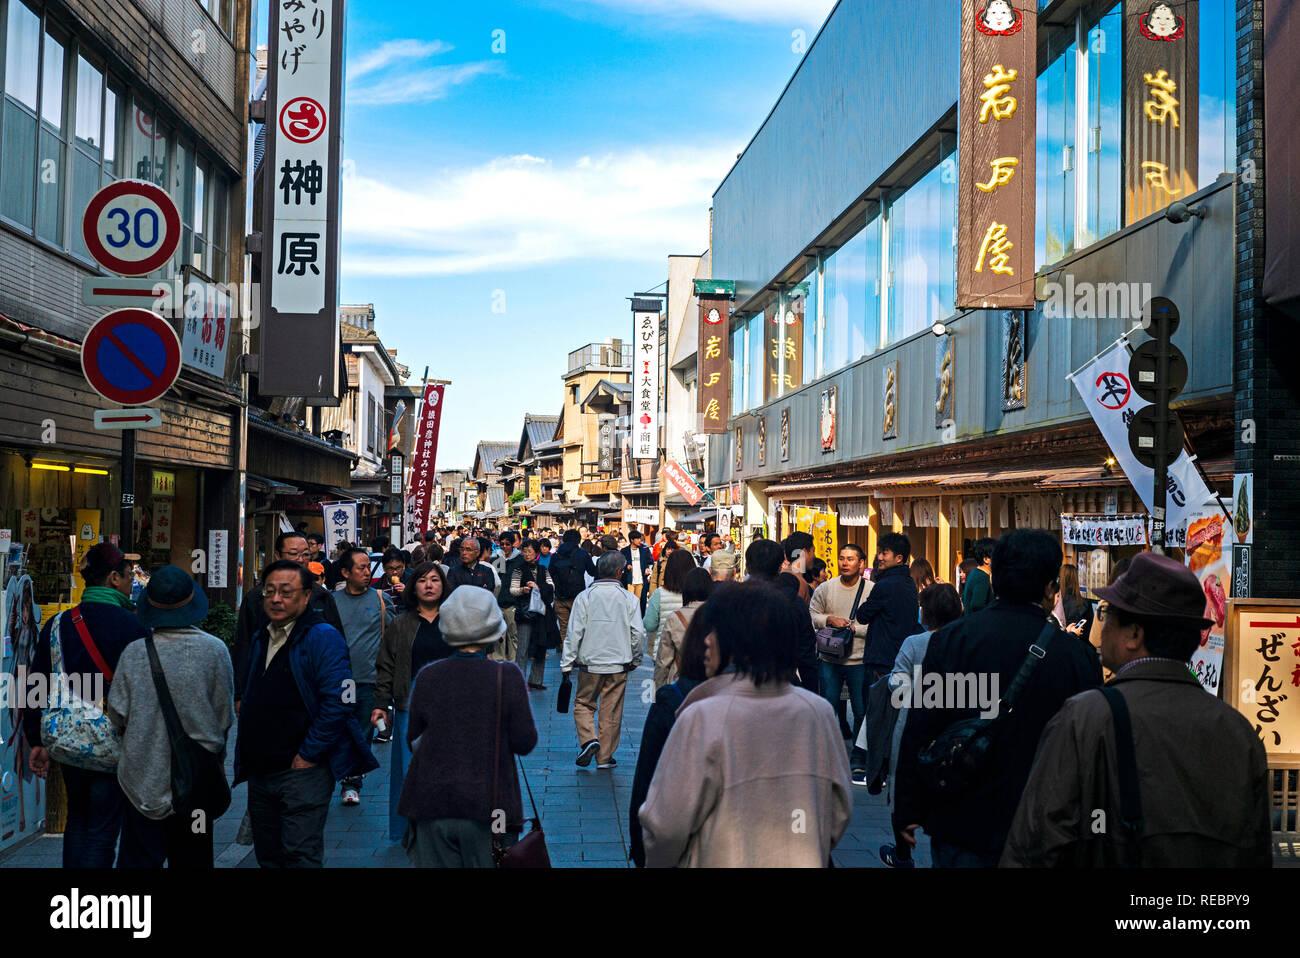 Pilgrims and tourists strolling along the shopping street next to Ise Shrine's Naiku part, Japan - Stock Image